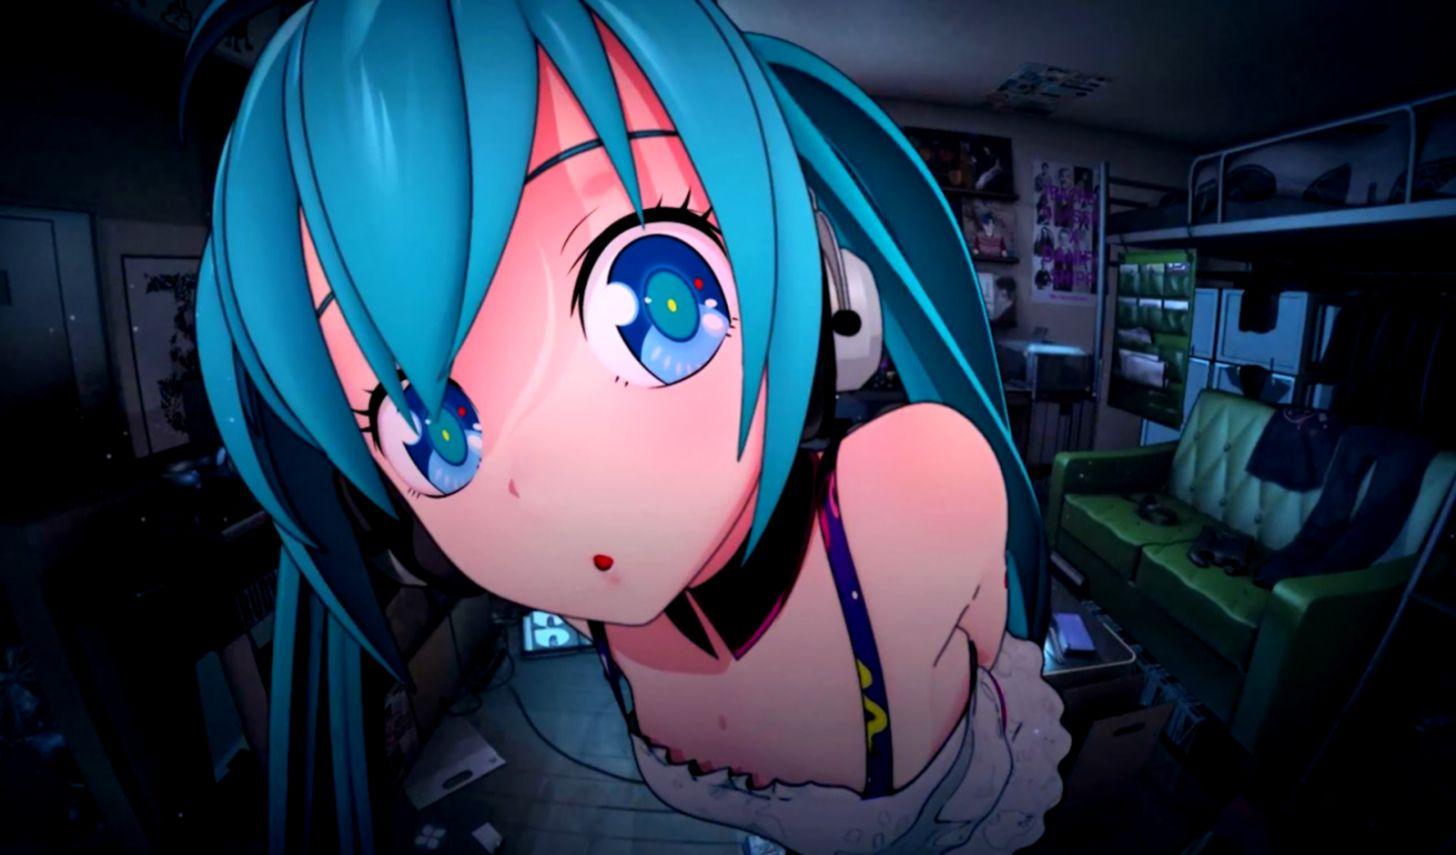 Download Wallpaper Hd Desktop Anime Hd Cikimm Com